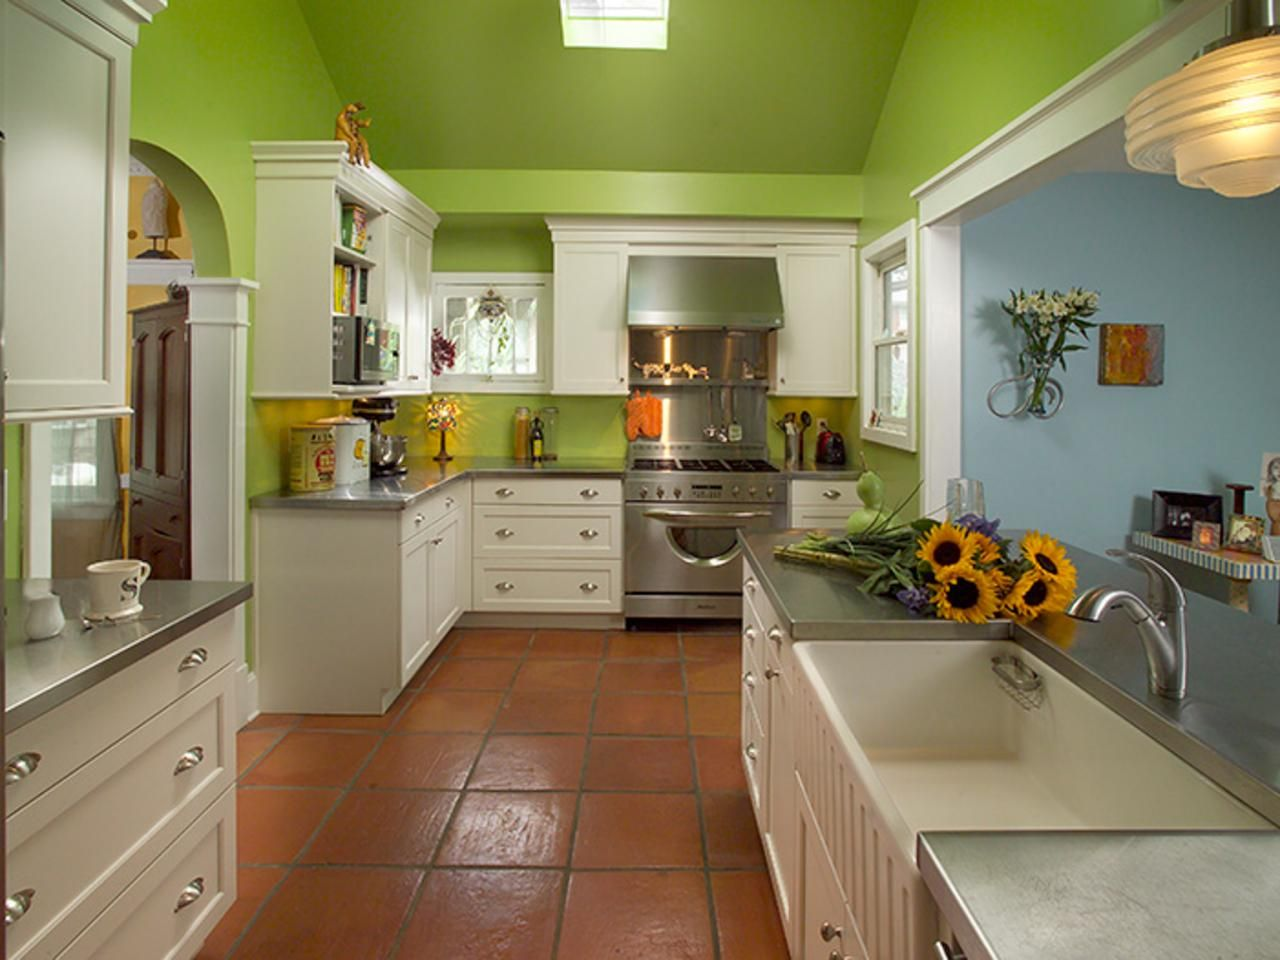 Bright Green Kitchen Makeover Green kitchen, Green